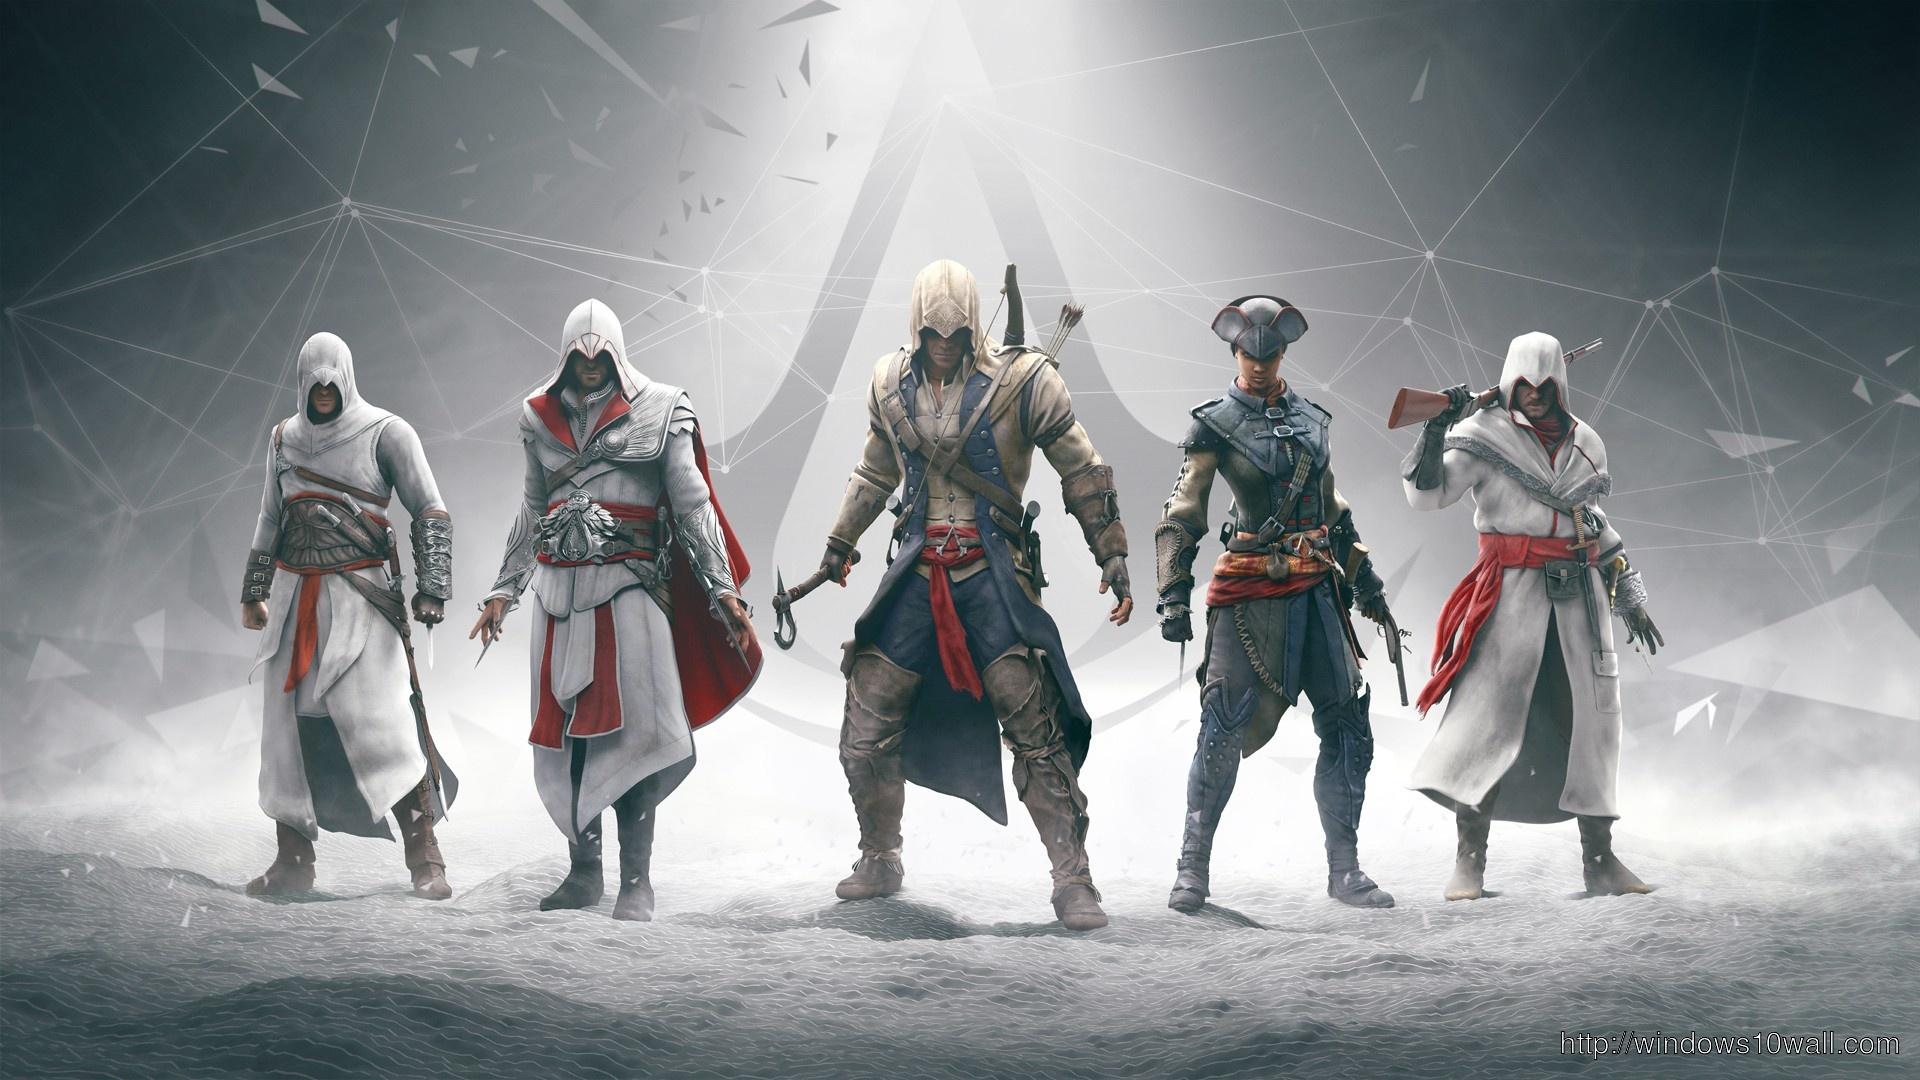 Hd assassins creed background wallpaper